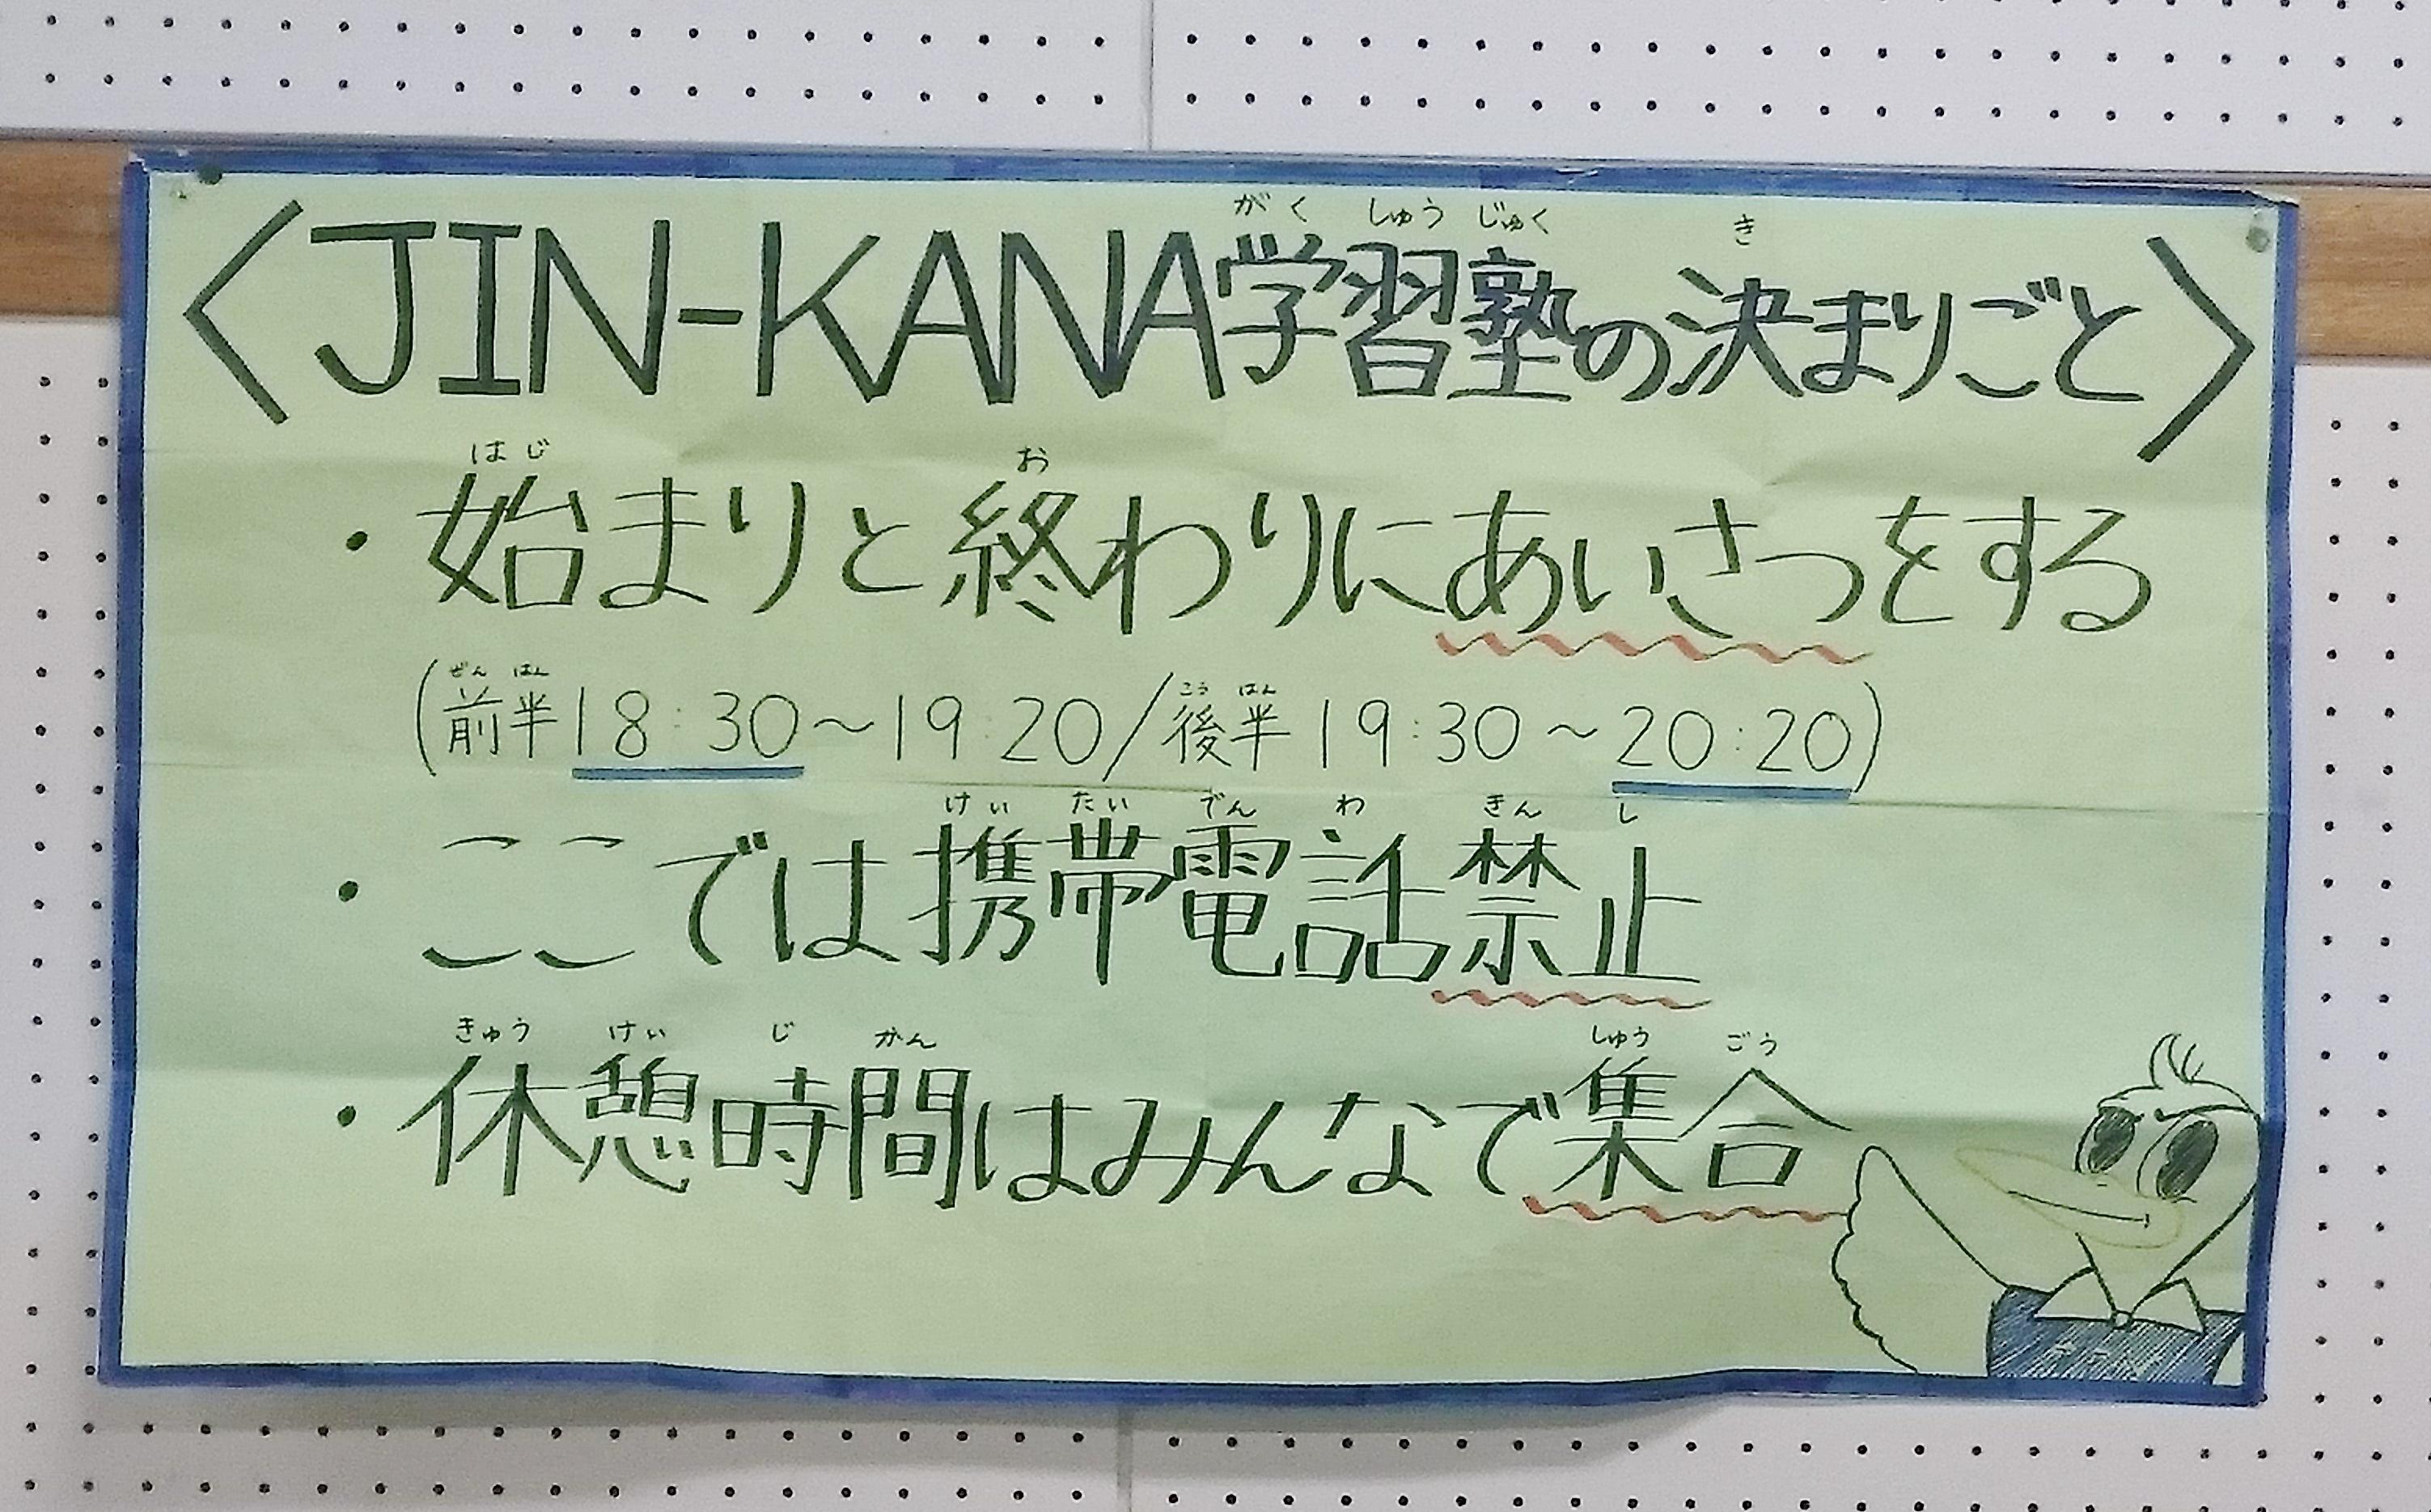 JIN-KANA学習塾 神奈川区と神奈川大学の協働「寄り添い型学習支援事業」